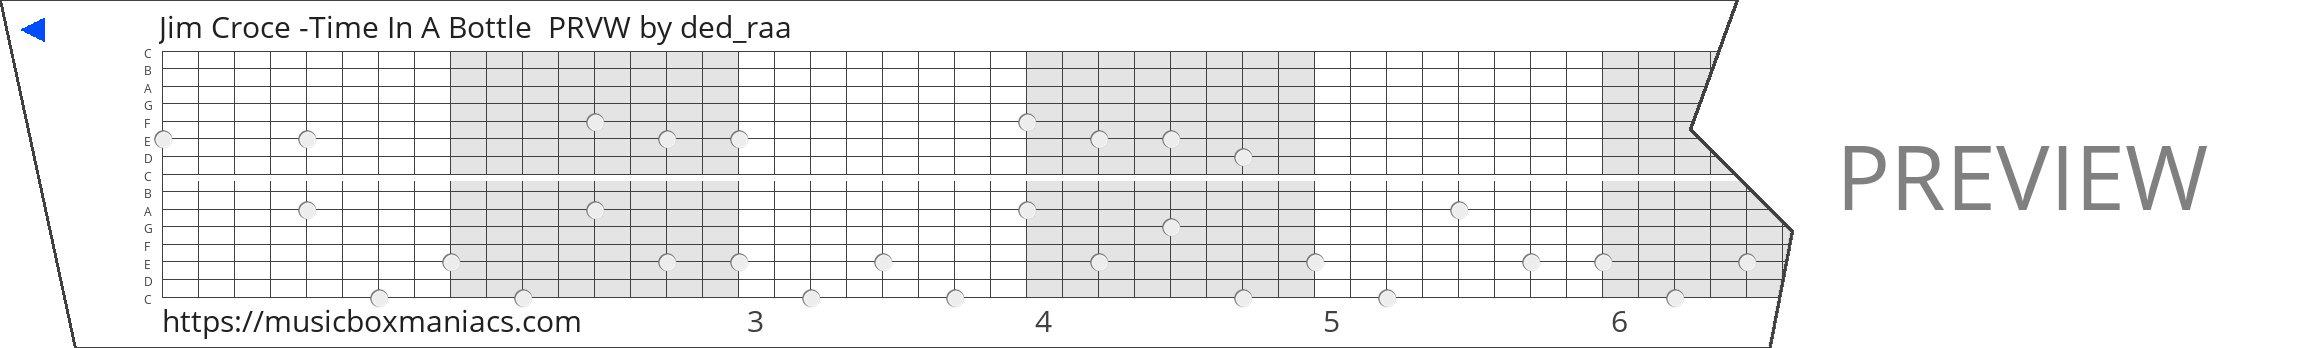 Jim Croce -Time In A Bottle  PRVW 15 note music box paper strip